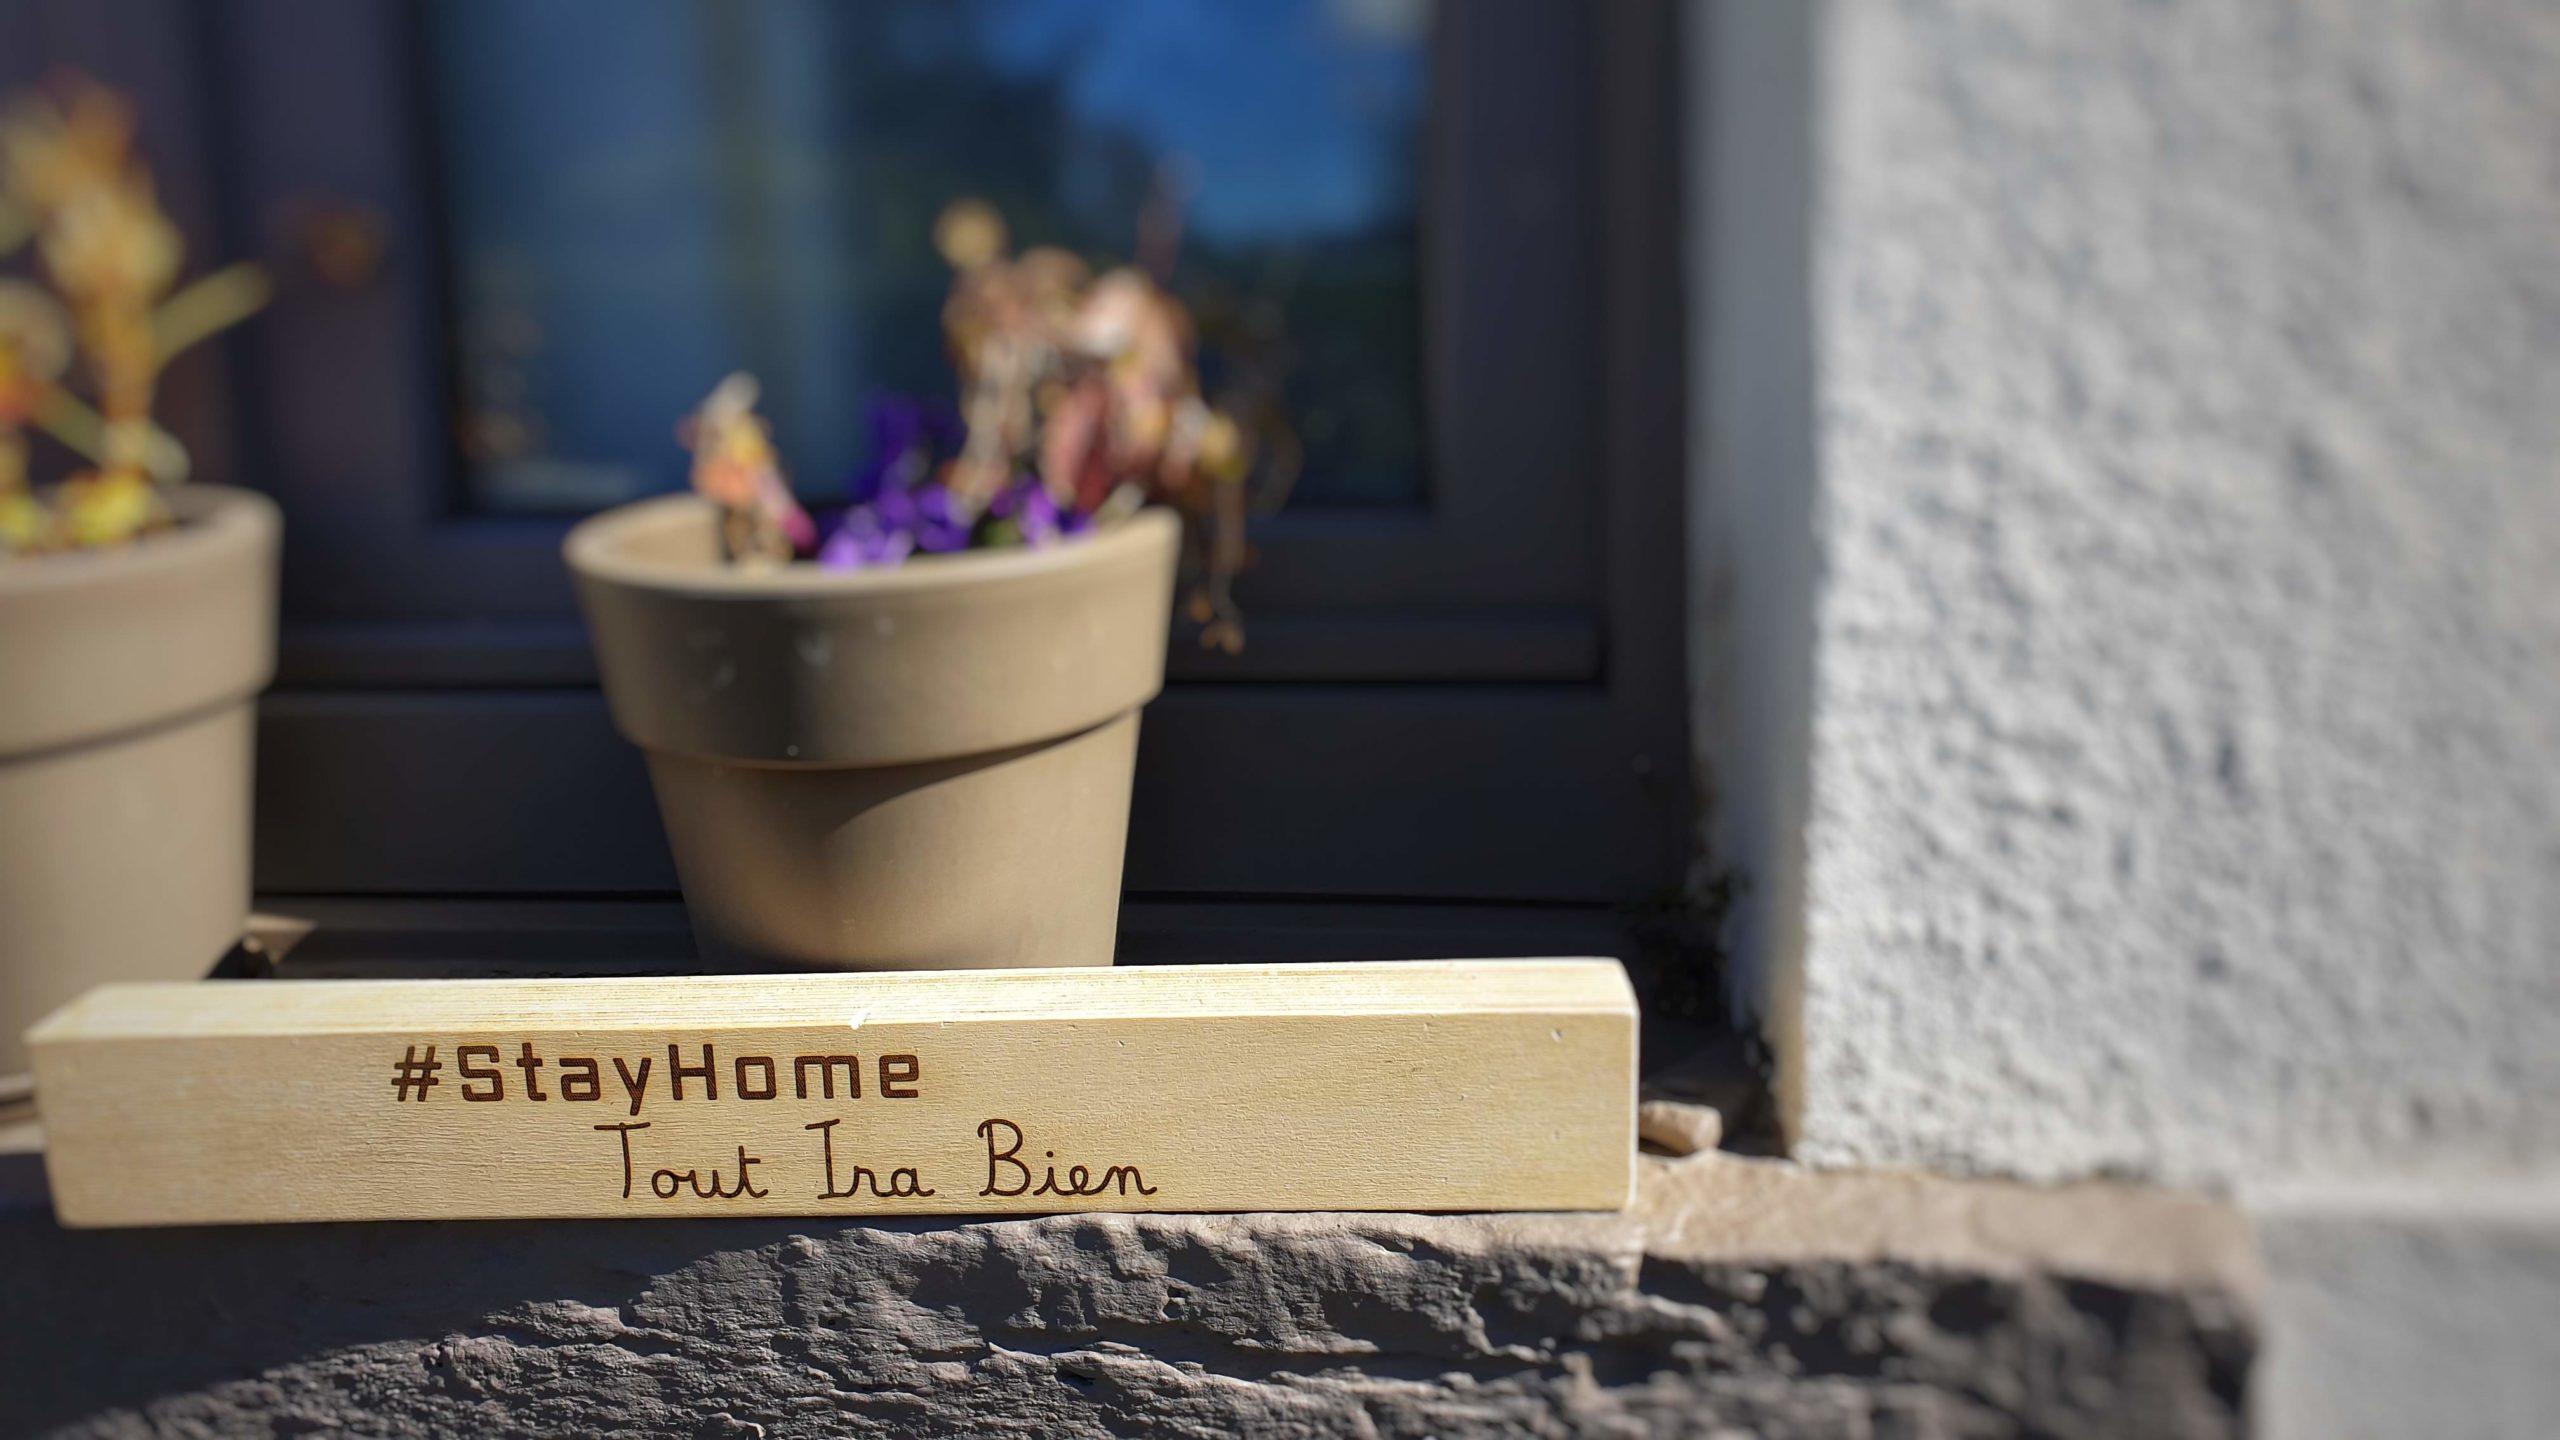 #StayHome tout ira bien